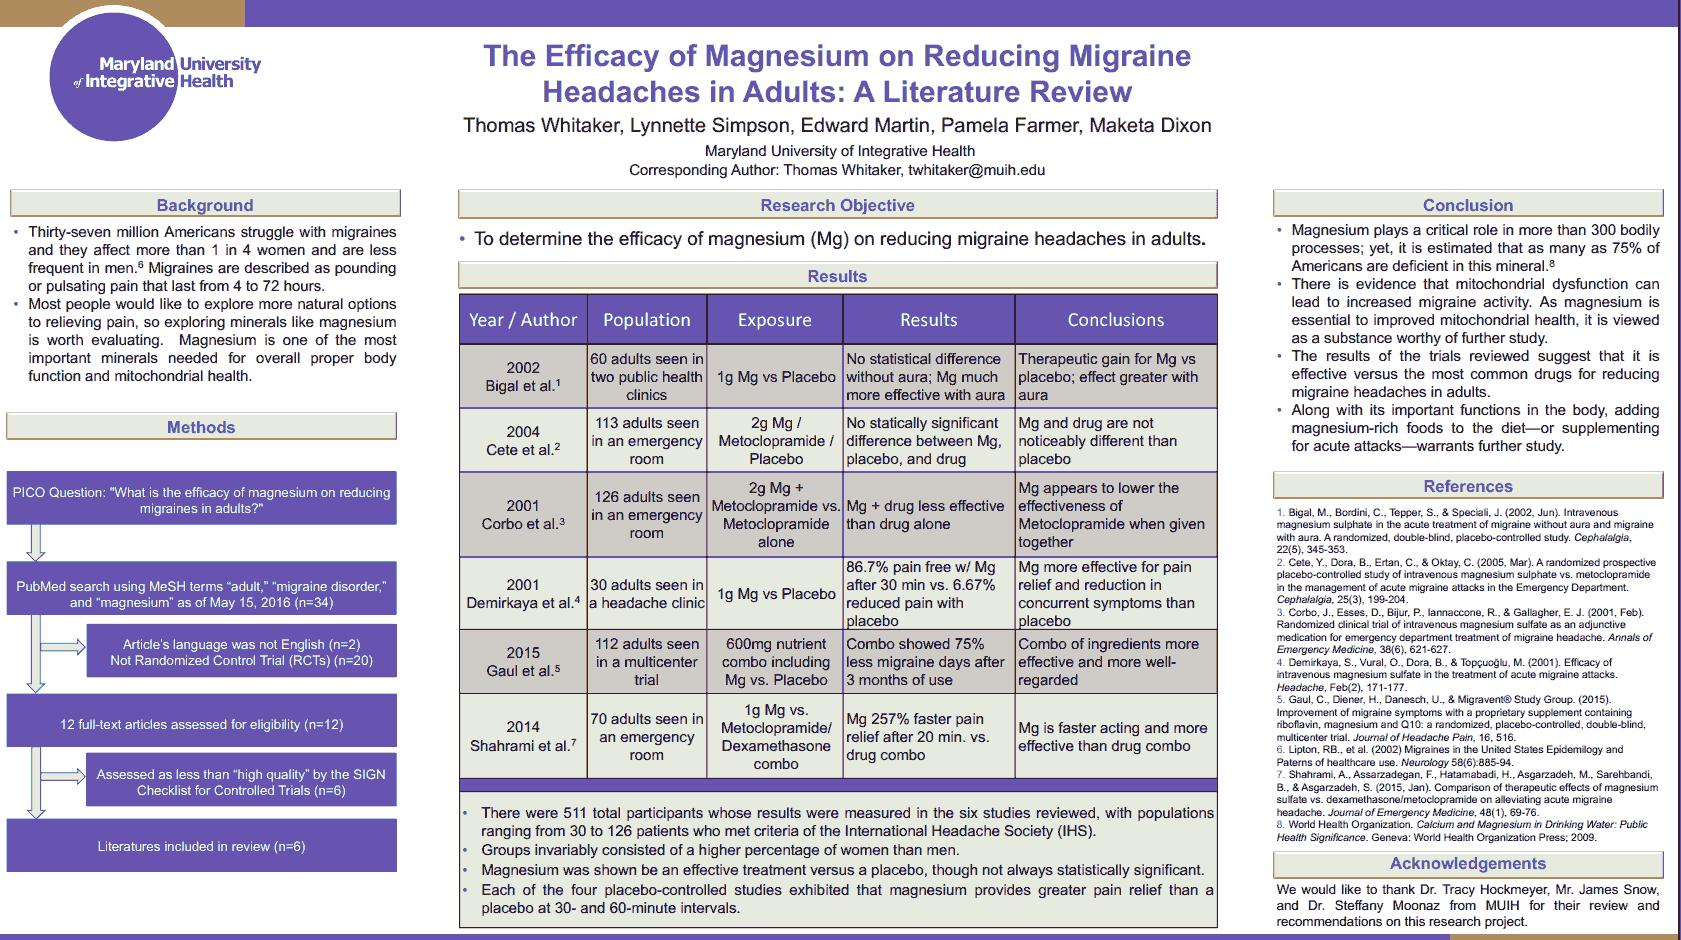 Магнезия уколы при мигрени - Мигрень